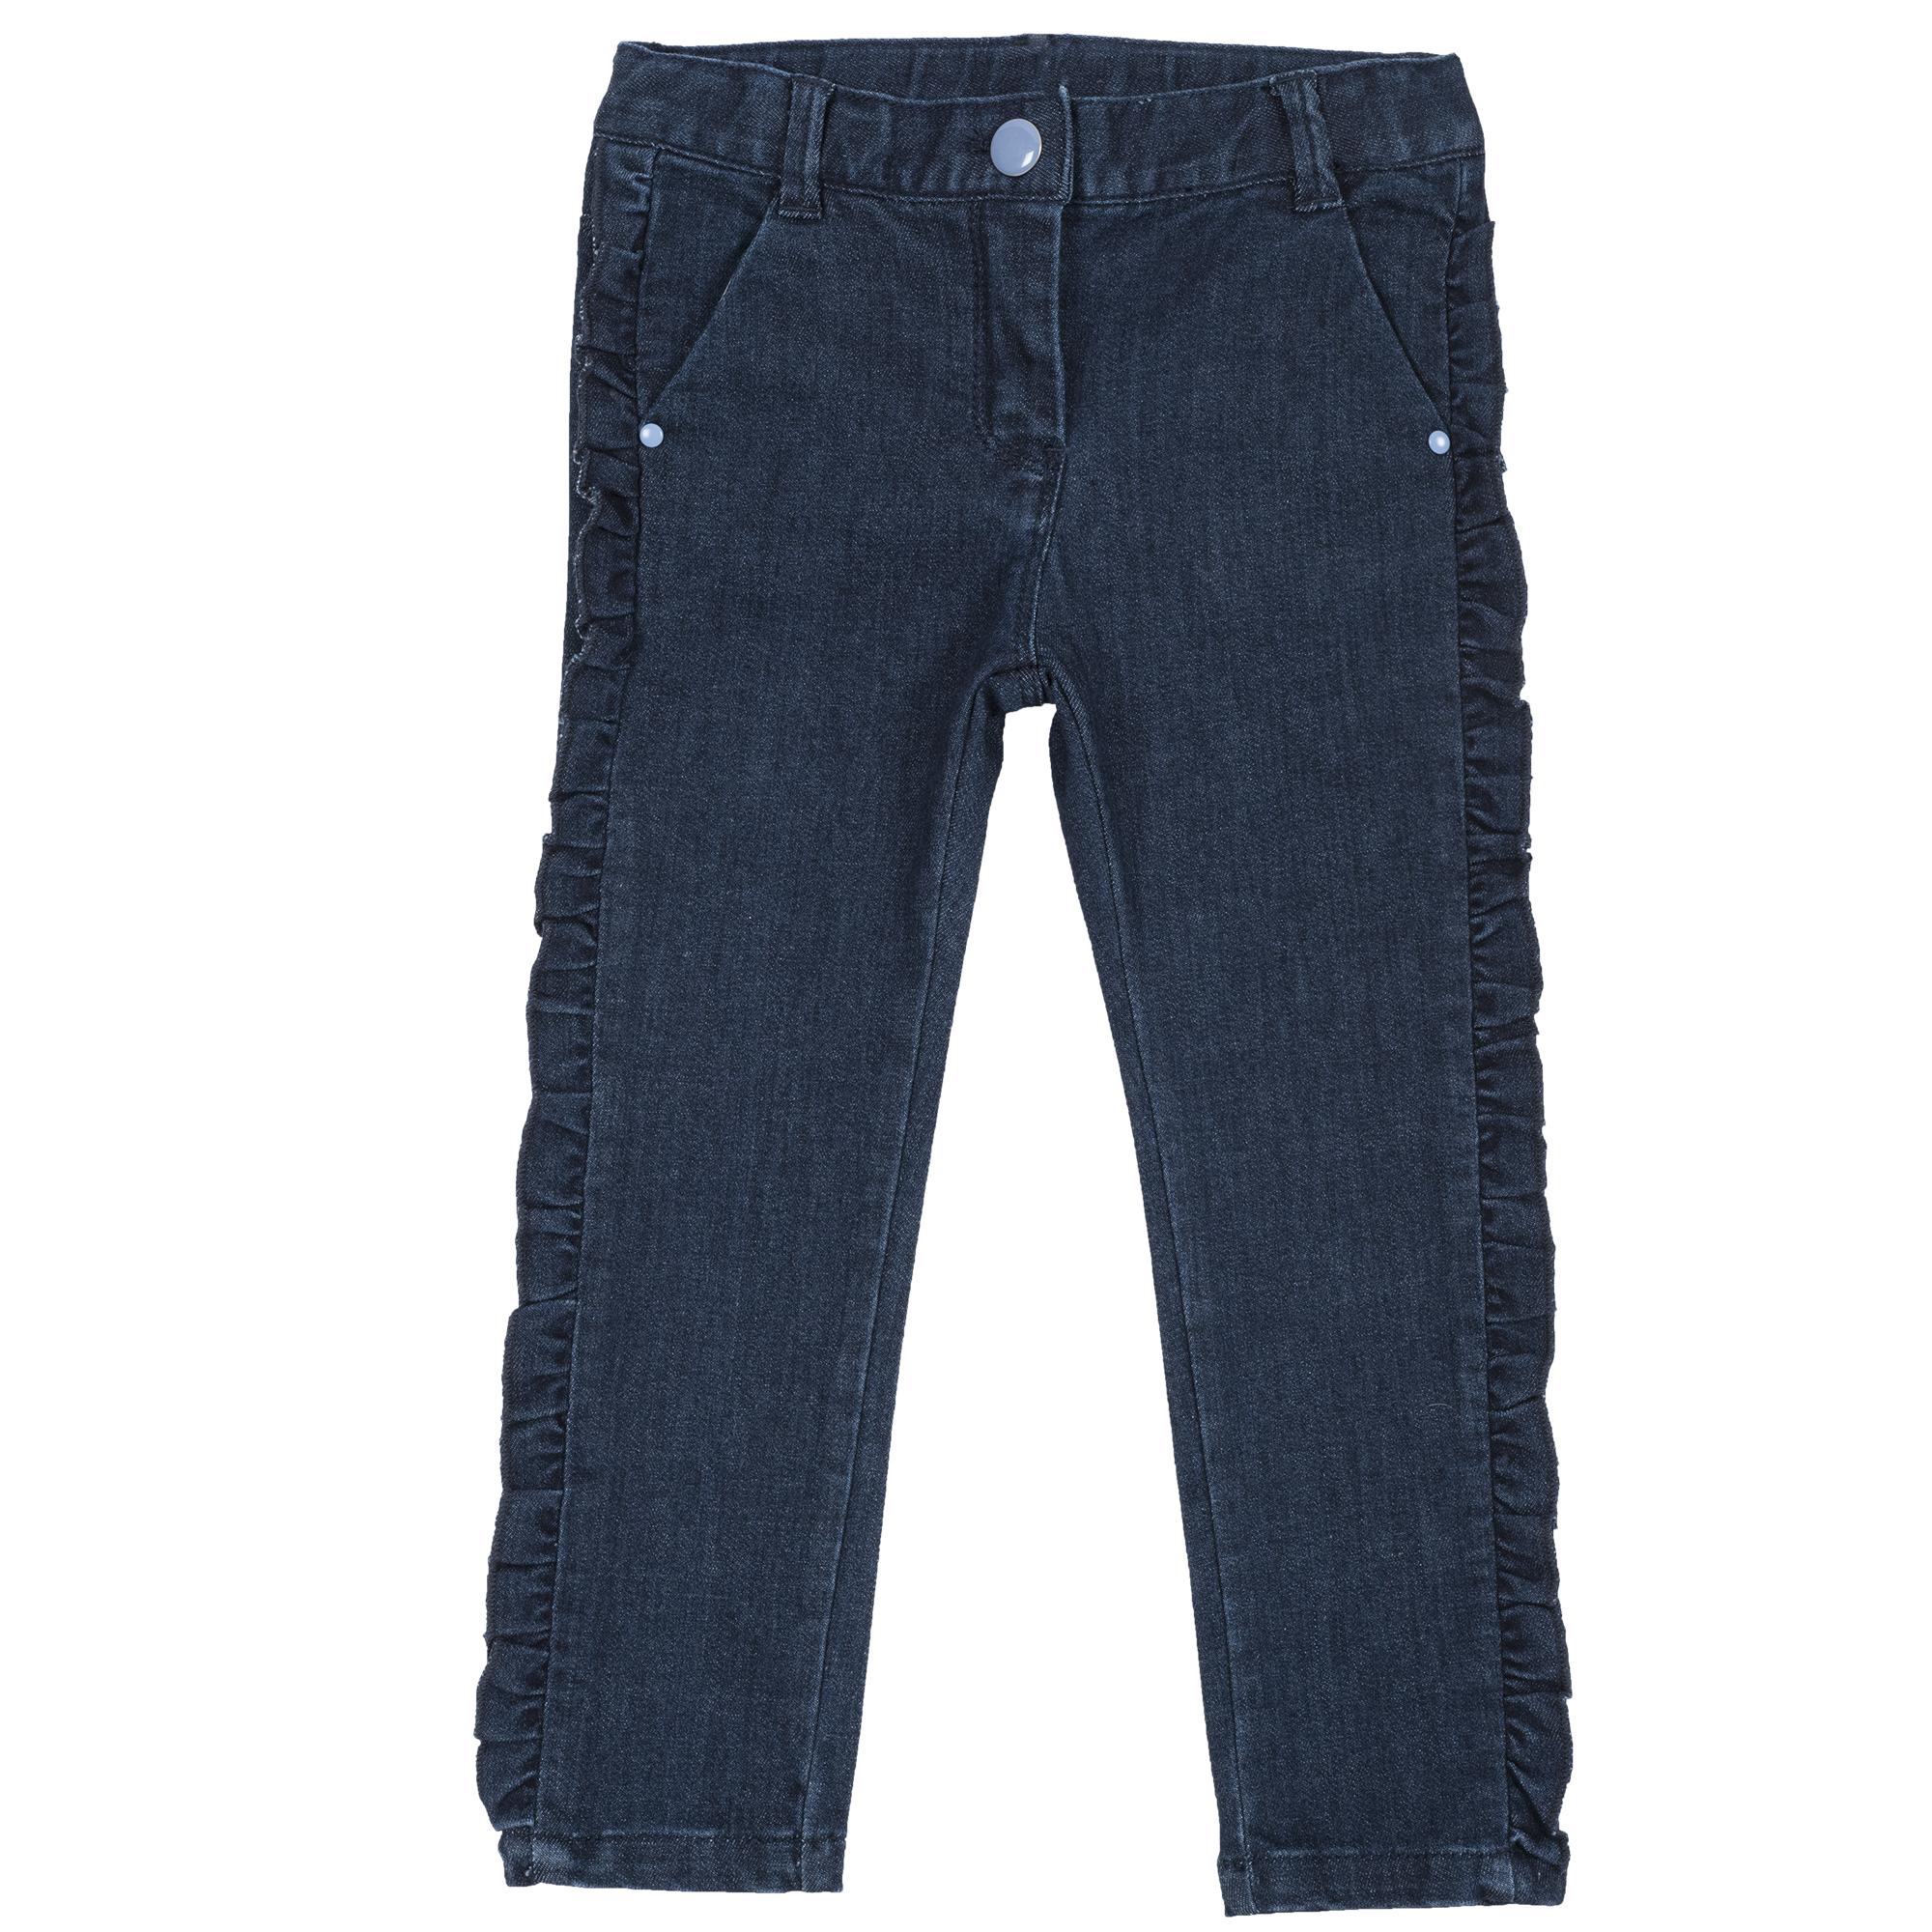 Chicco Pantalon copii Chicco albastru inchis 128